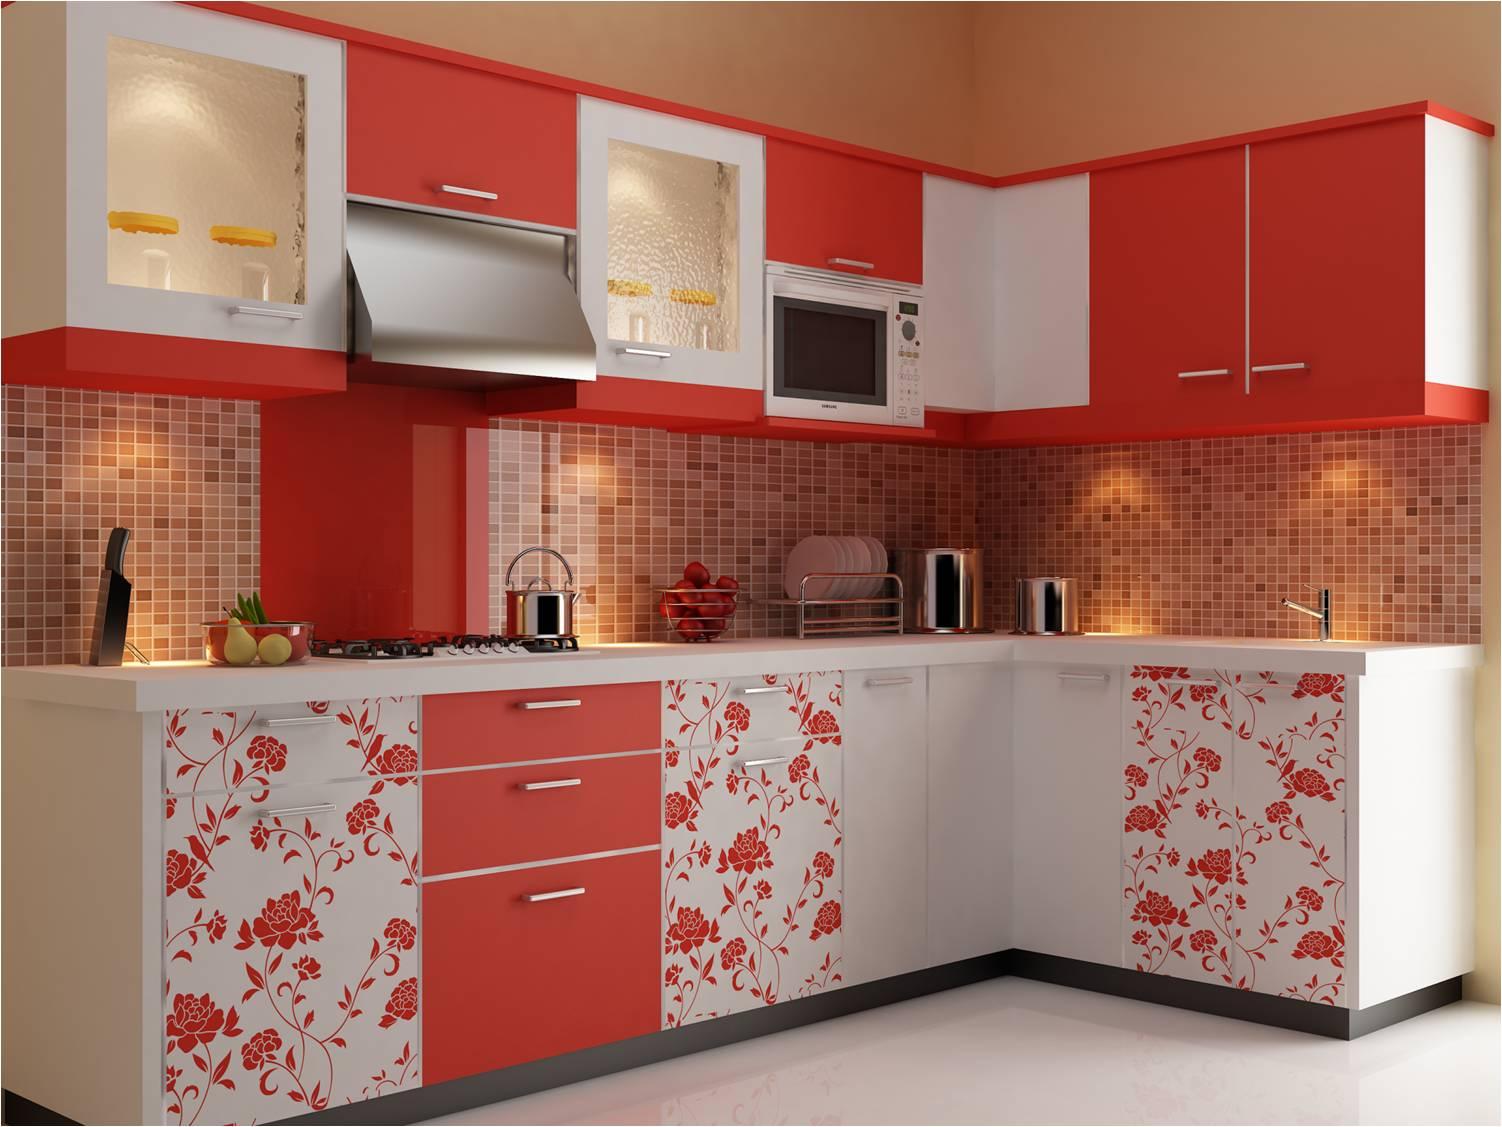 køkken-acralyc-1